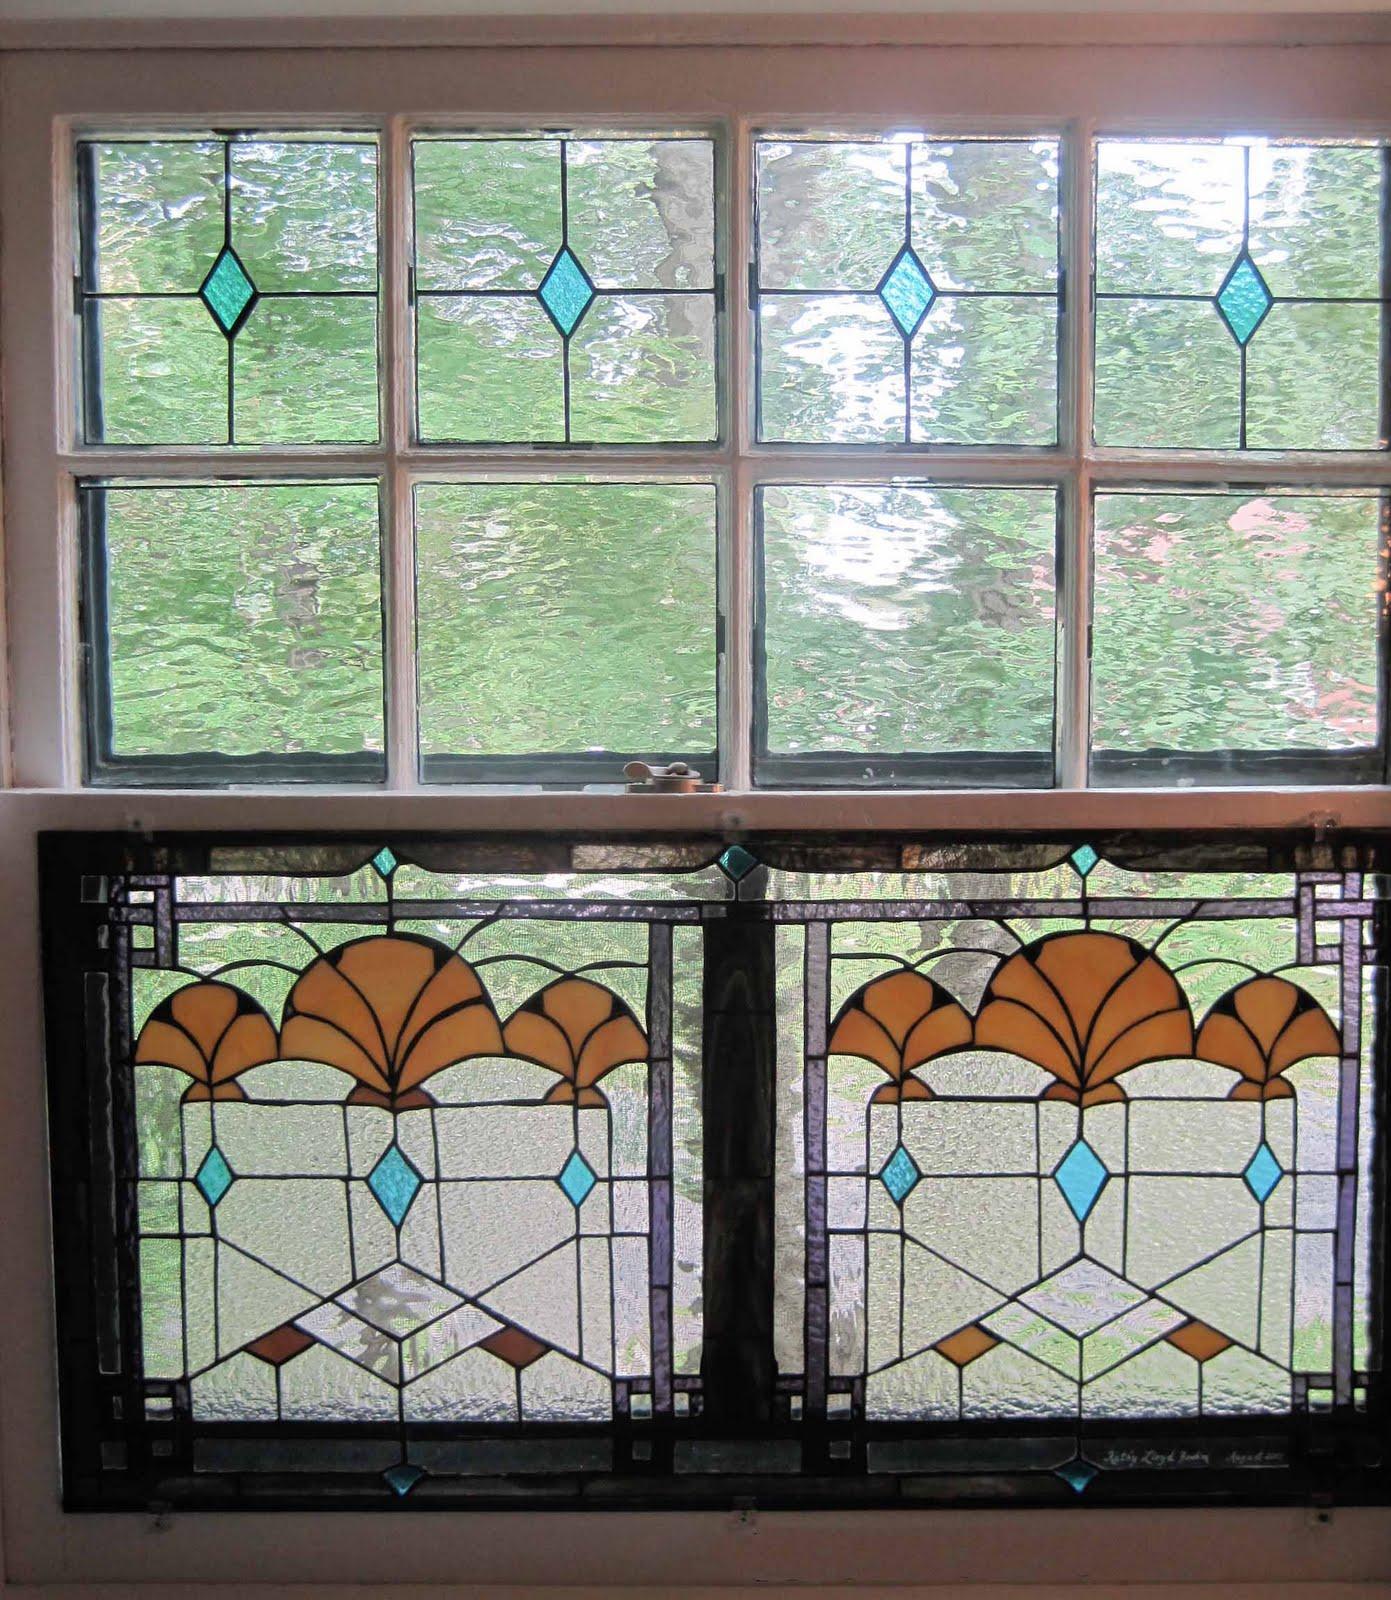 boehm stained glass blog art deco windows installed. Black Bedroom Furniture Sets. Home Design Ideas